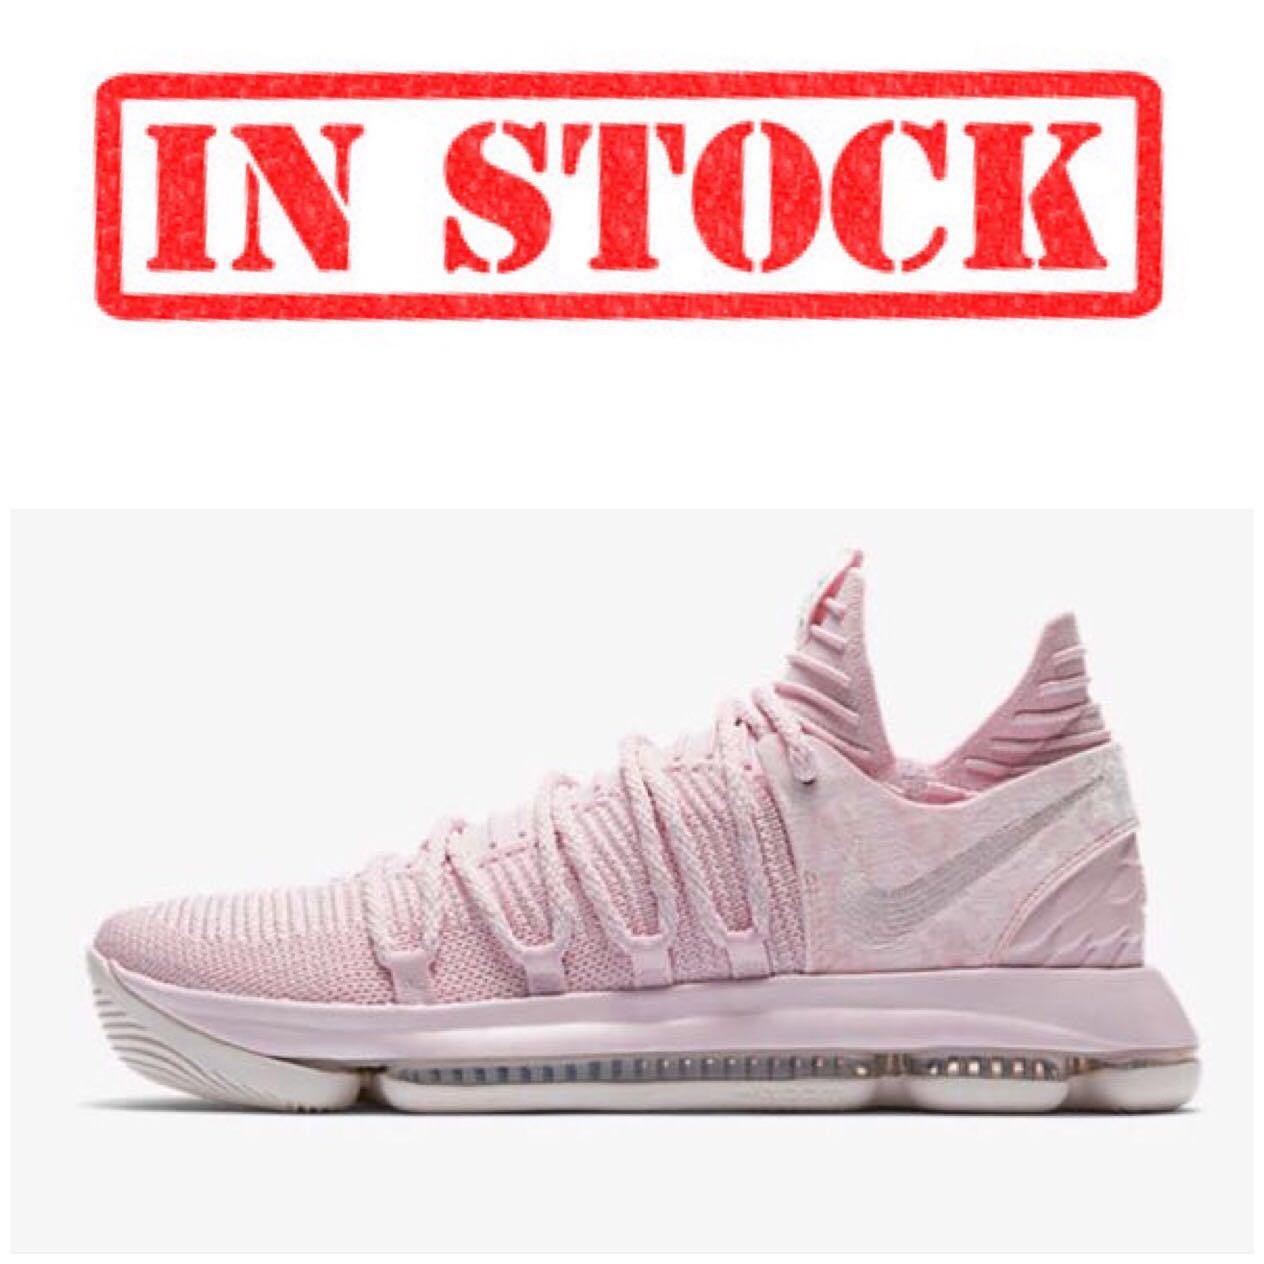 c4777880c42 IN STOCK Men's Nike KDX AUNT PEARL | US Men's Size 14 | Updated Actual  Pictures